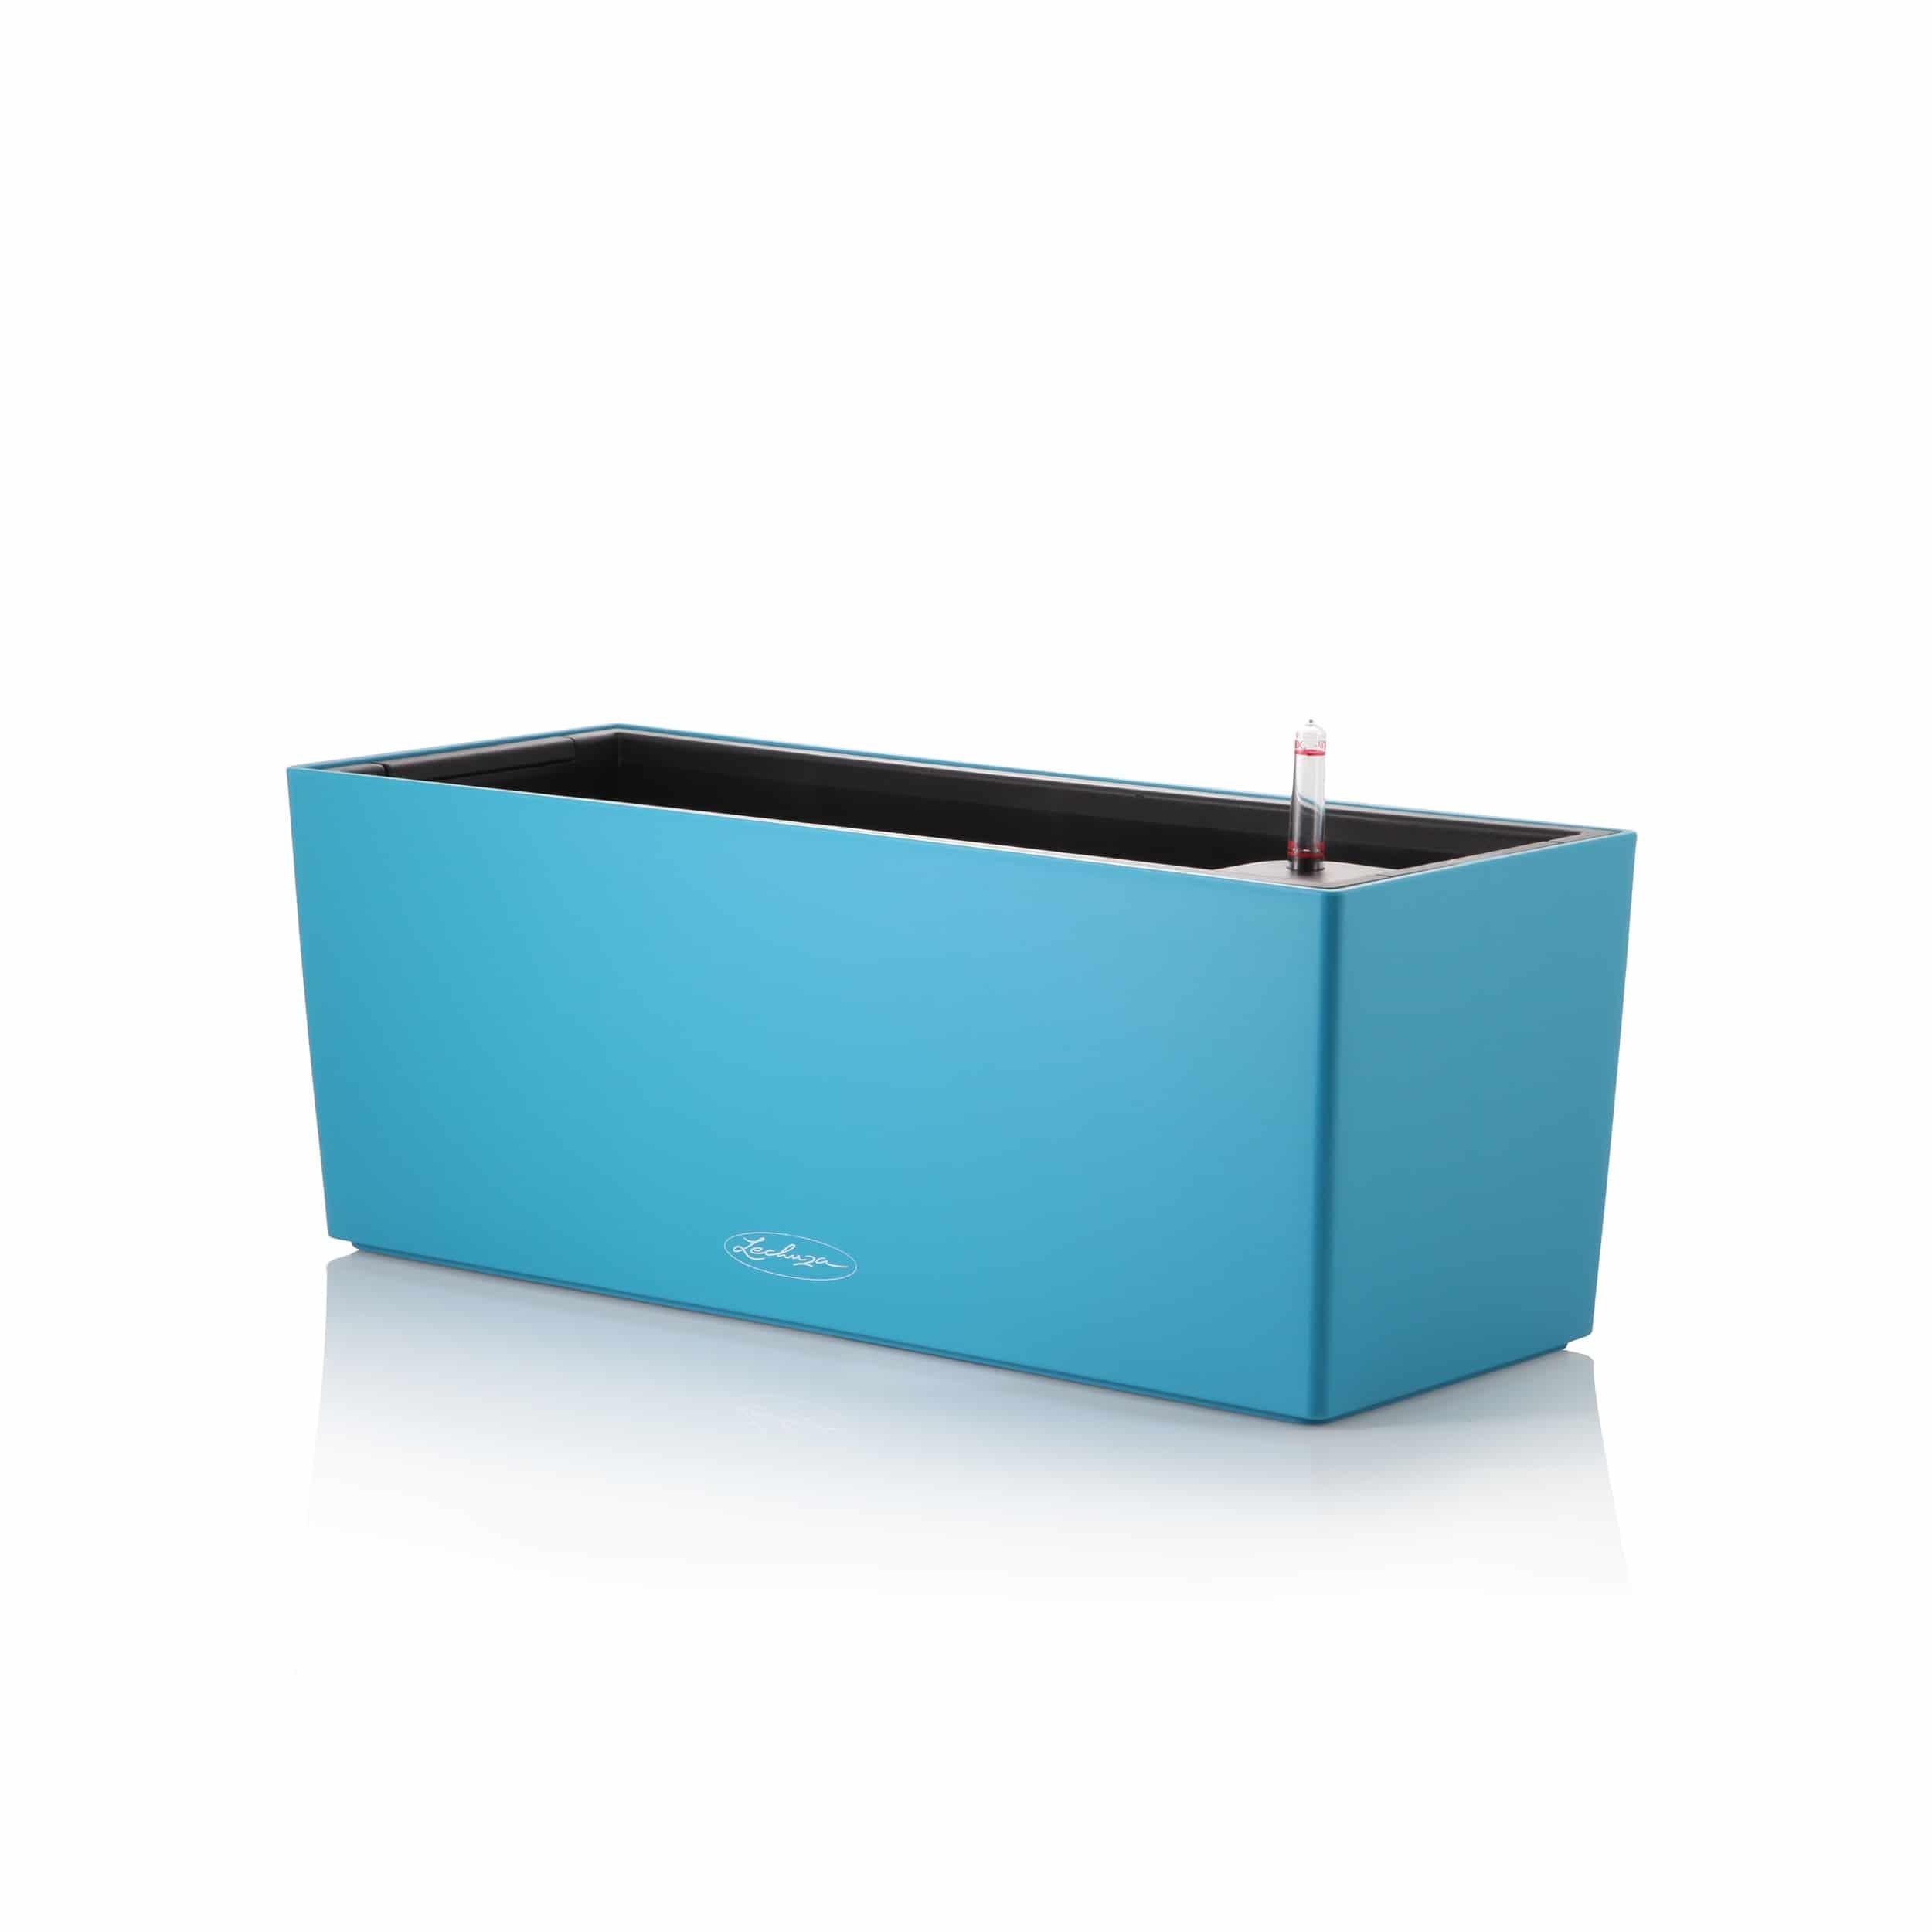 Blumenkasten Balconera Color All-in-One Set L50cm karibikblau